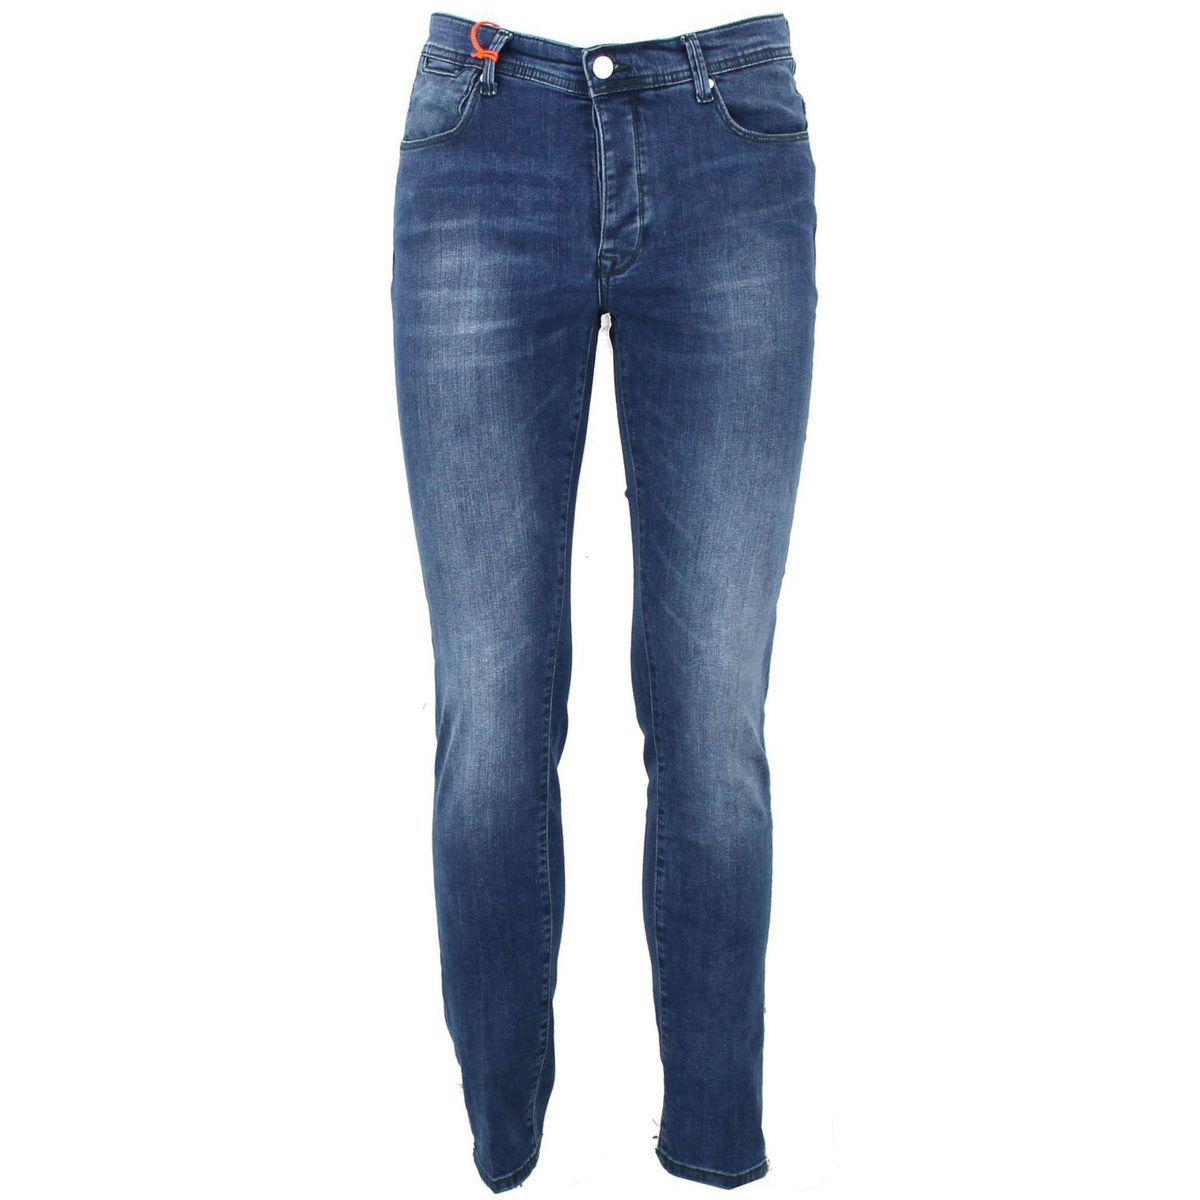 Jeans stretch leggero Denim At.p.co